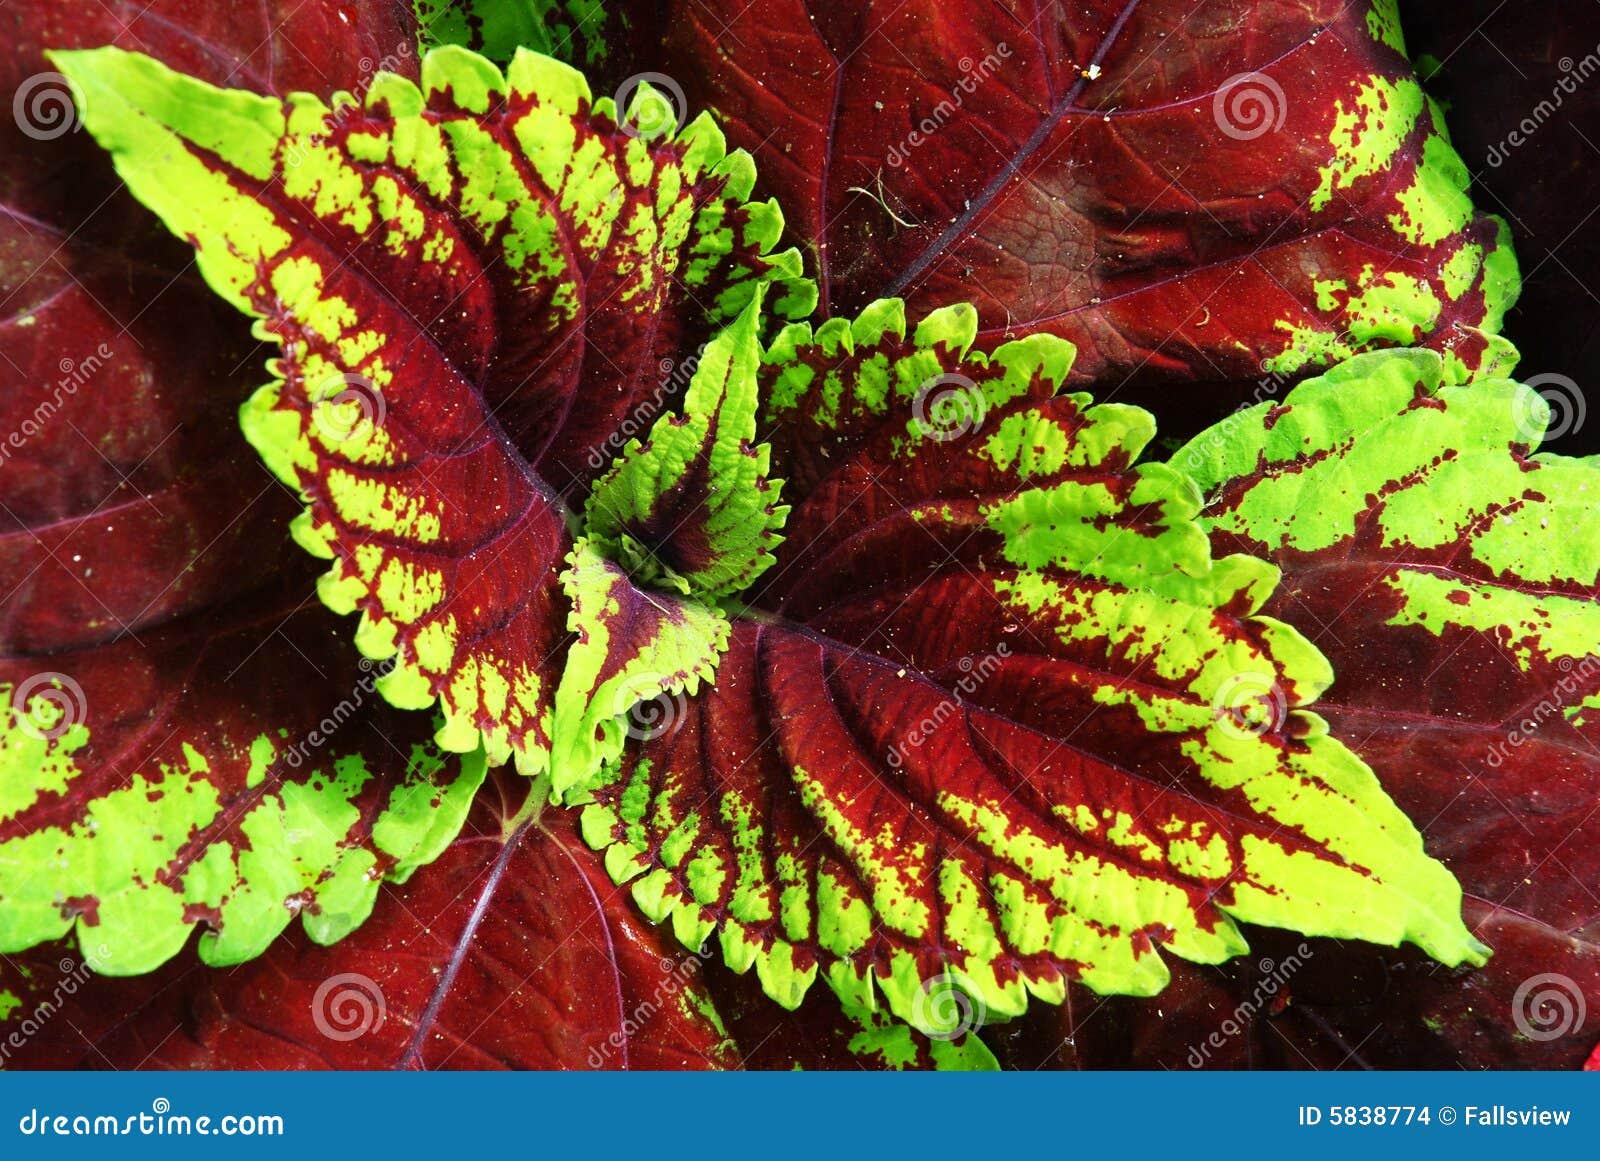 colorful leaf plants. colorful bedding plants colorful bedding, Natural flower